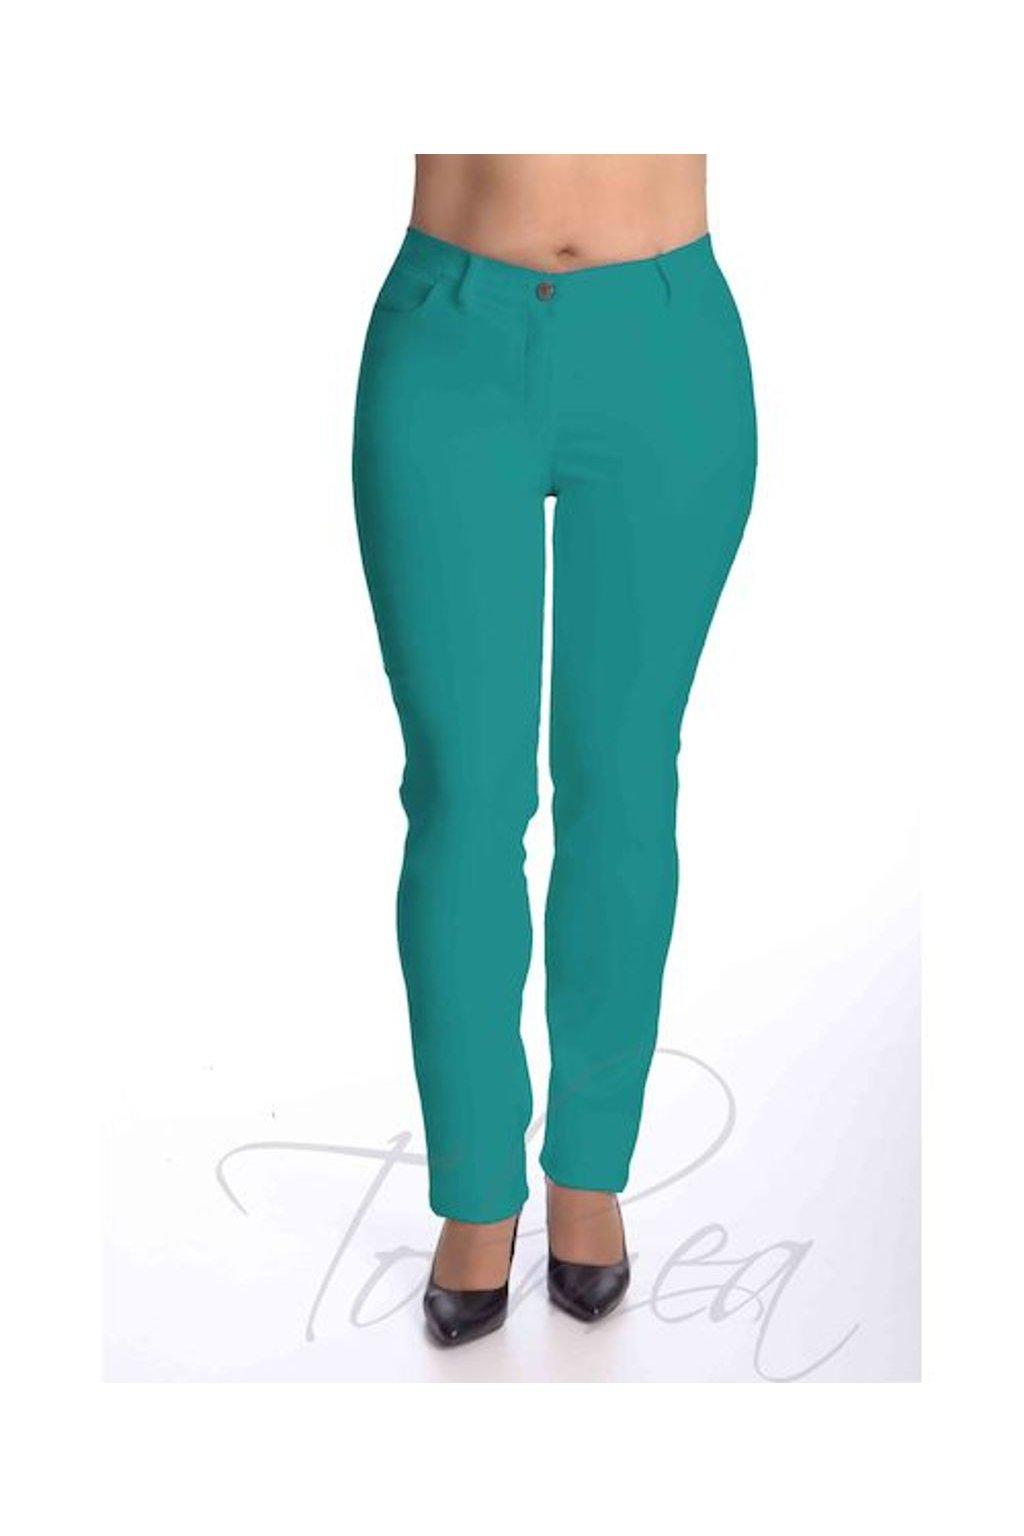 Kalhoty elastické riflové dlouhé 45T (Velikost 38, Barva Bílá)